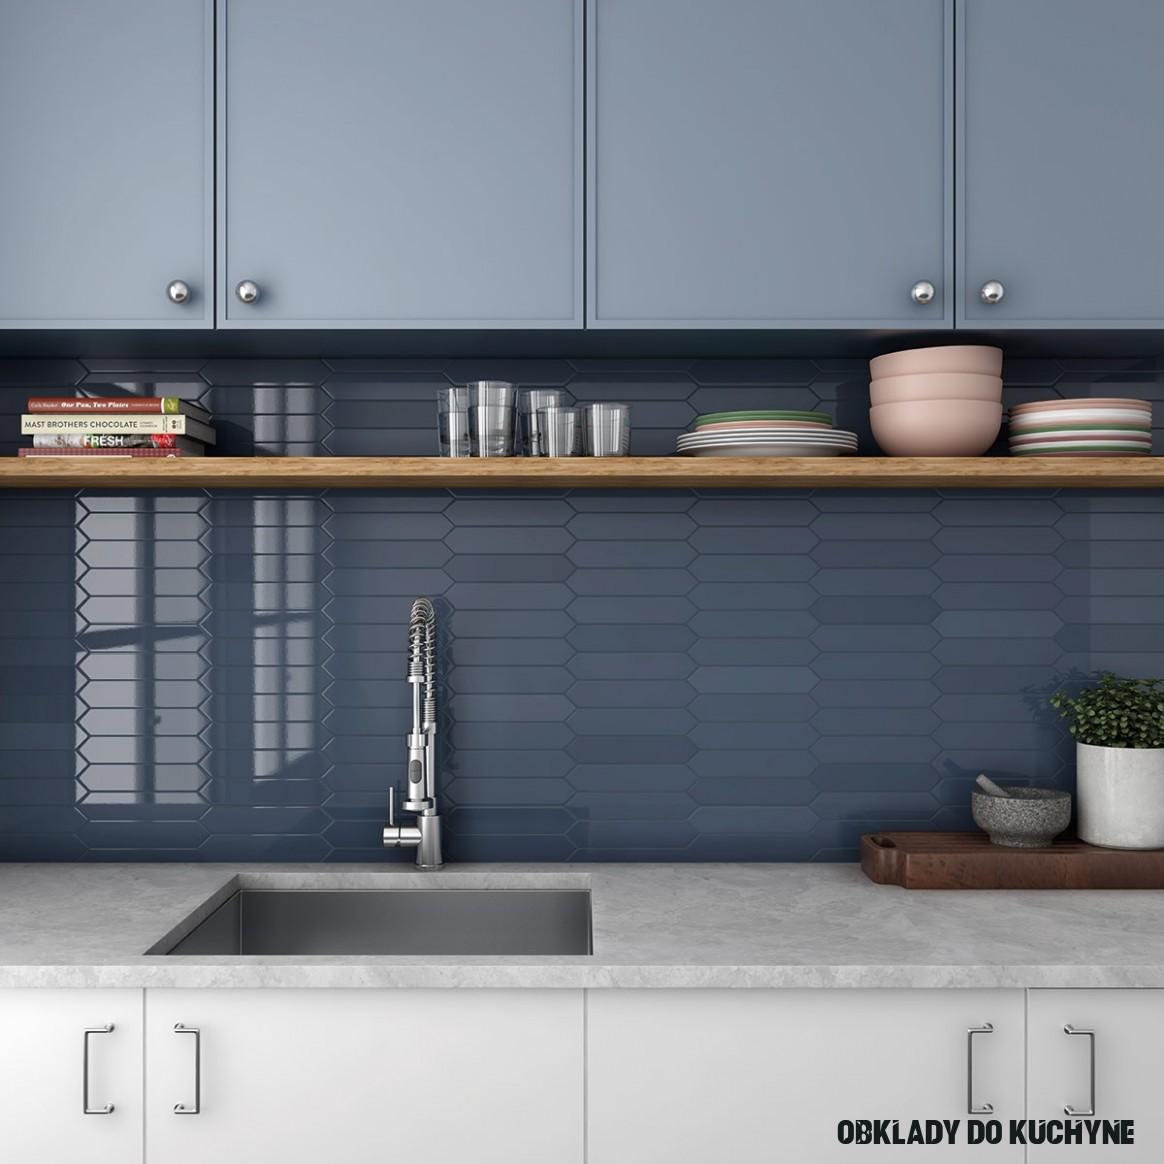 EQUIPE ARROW 11x211 cm obklad do kuchyne a do kúpeľne -111%